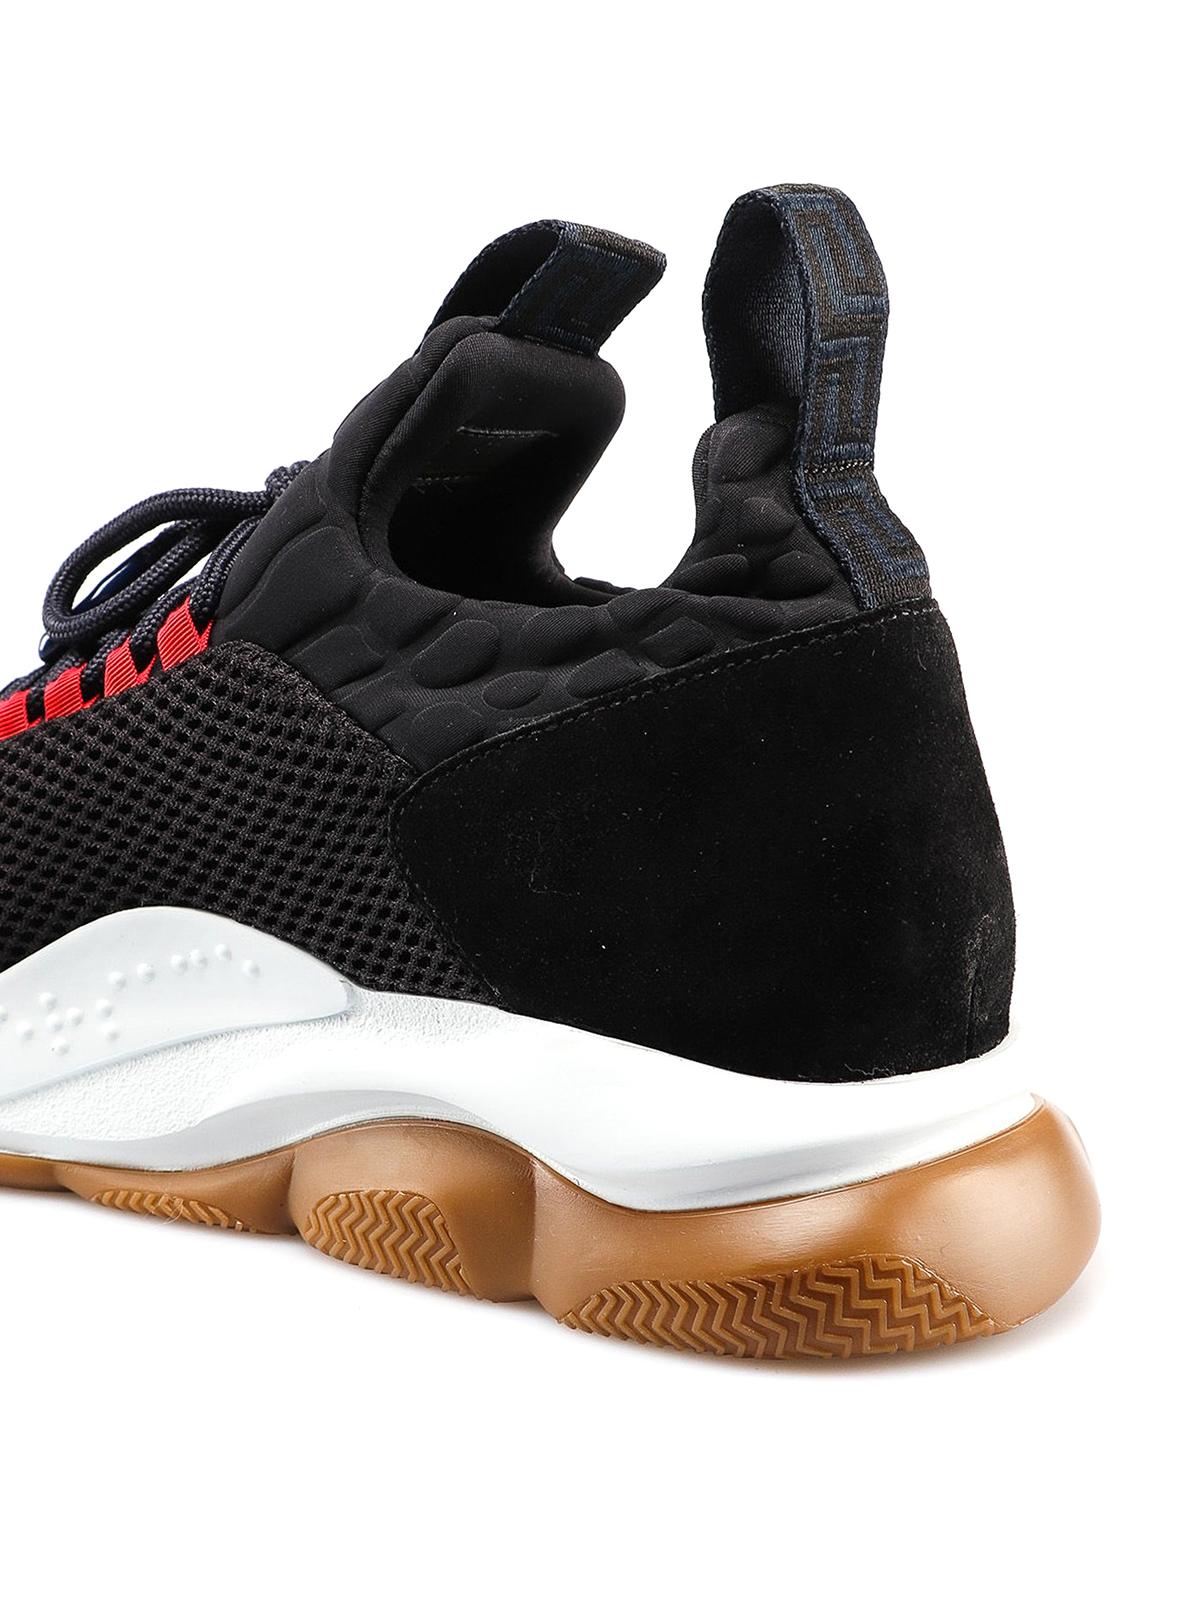 Versace - Cross Chainer black sneakers